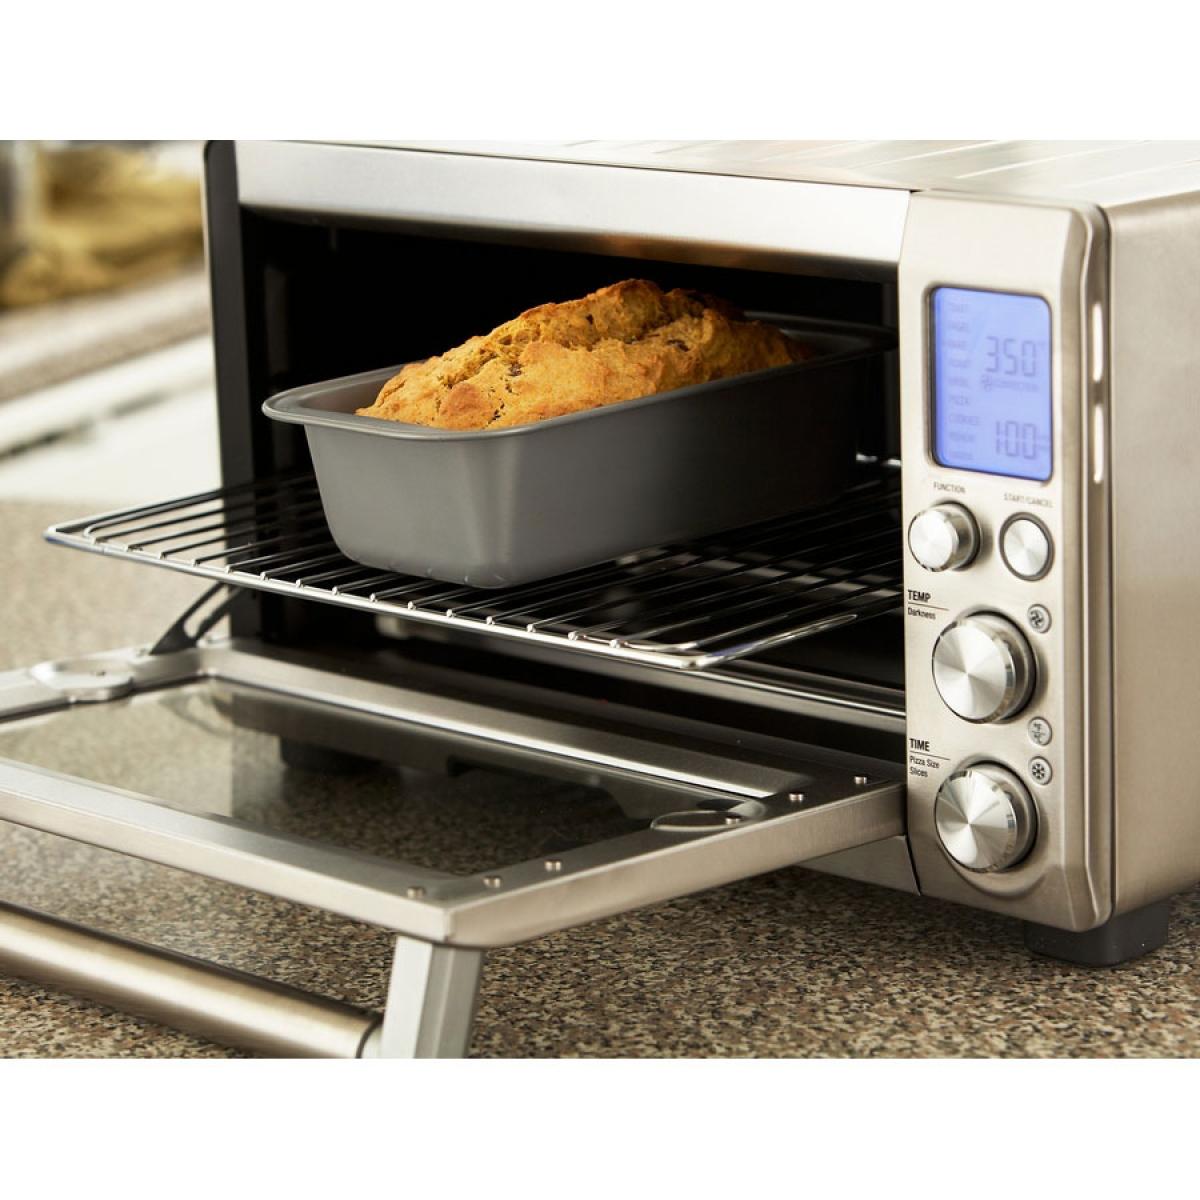 Breville-Smart-Oven-BOV800XL-1qv84b0h4ttjlbbb8nuaupffp9rlvgo14b36u3a6pgx0